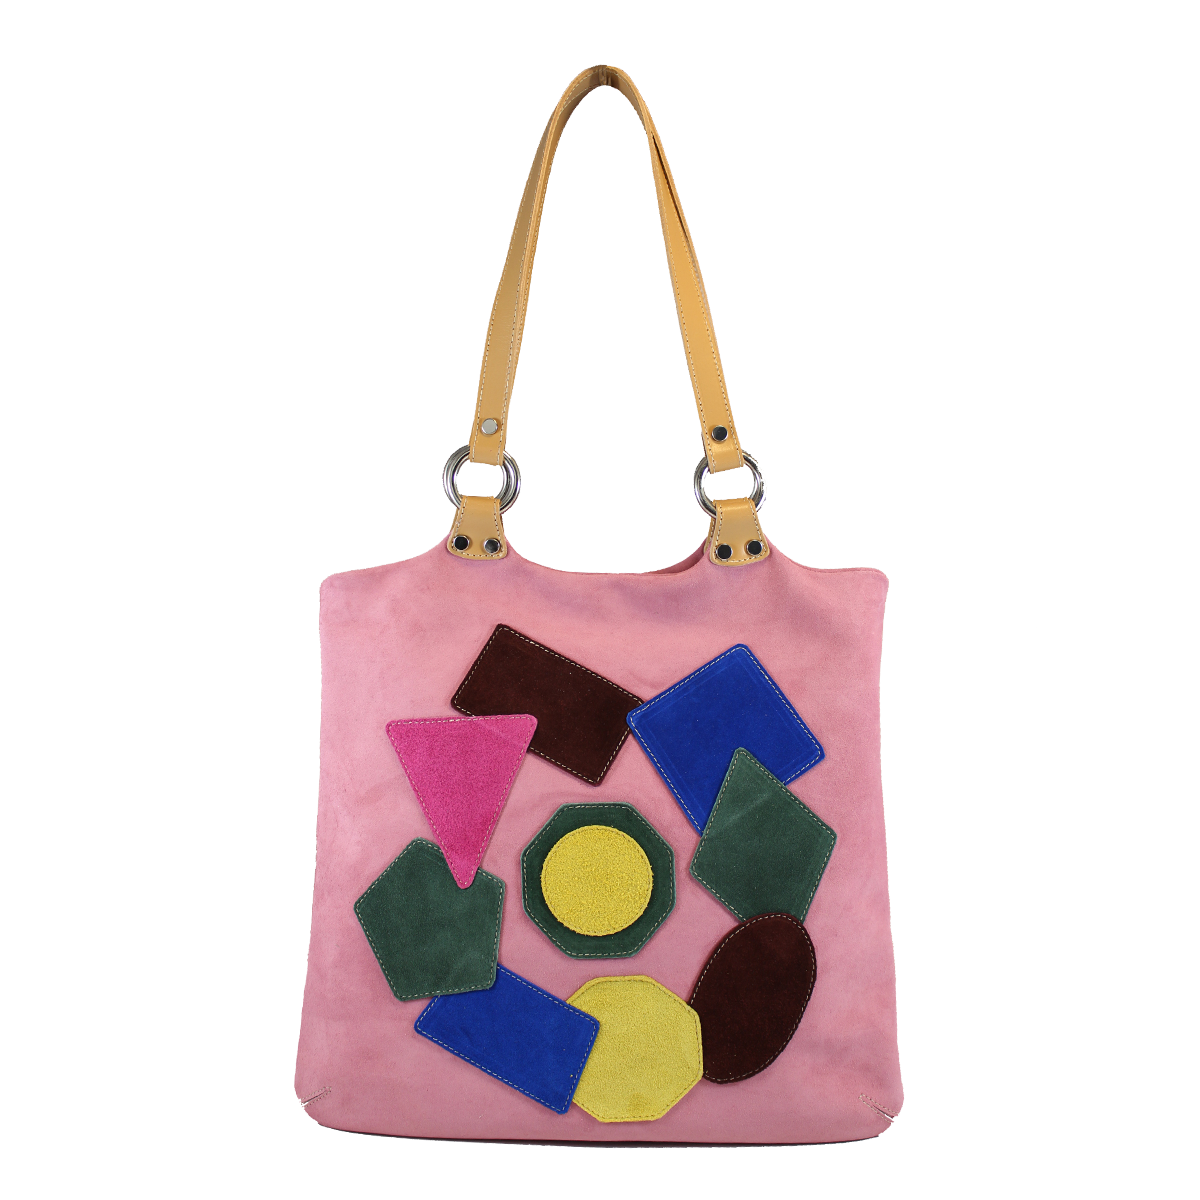 Artist Bag By Roberto Cassella I Santi